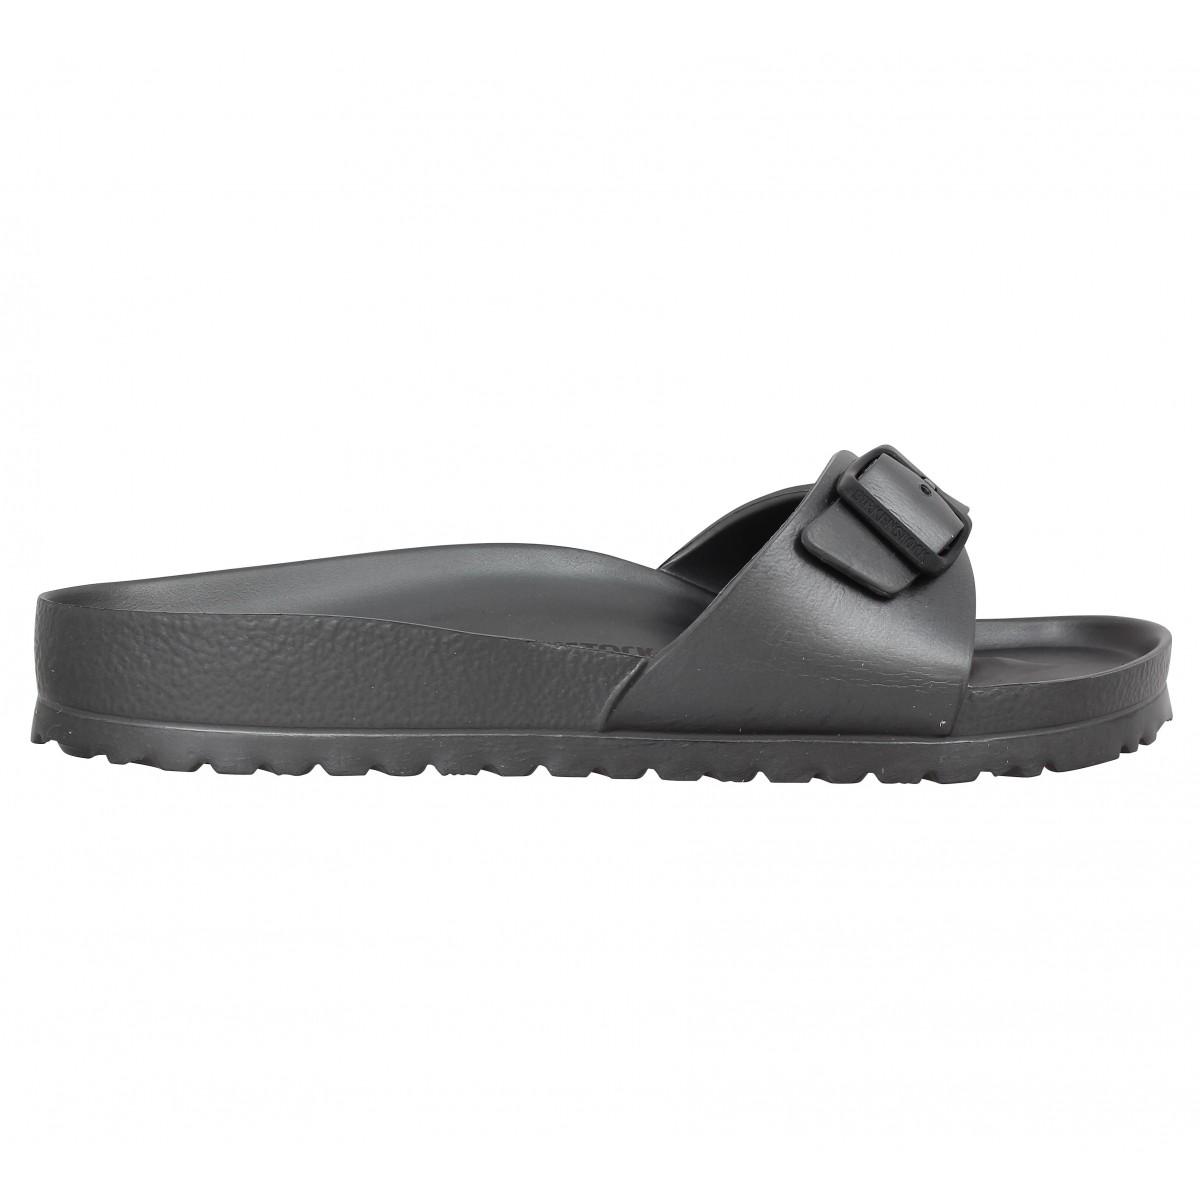 Birkenstock Madrid Eva Anthracite Gris - Chaussures Sandale Homme